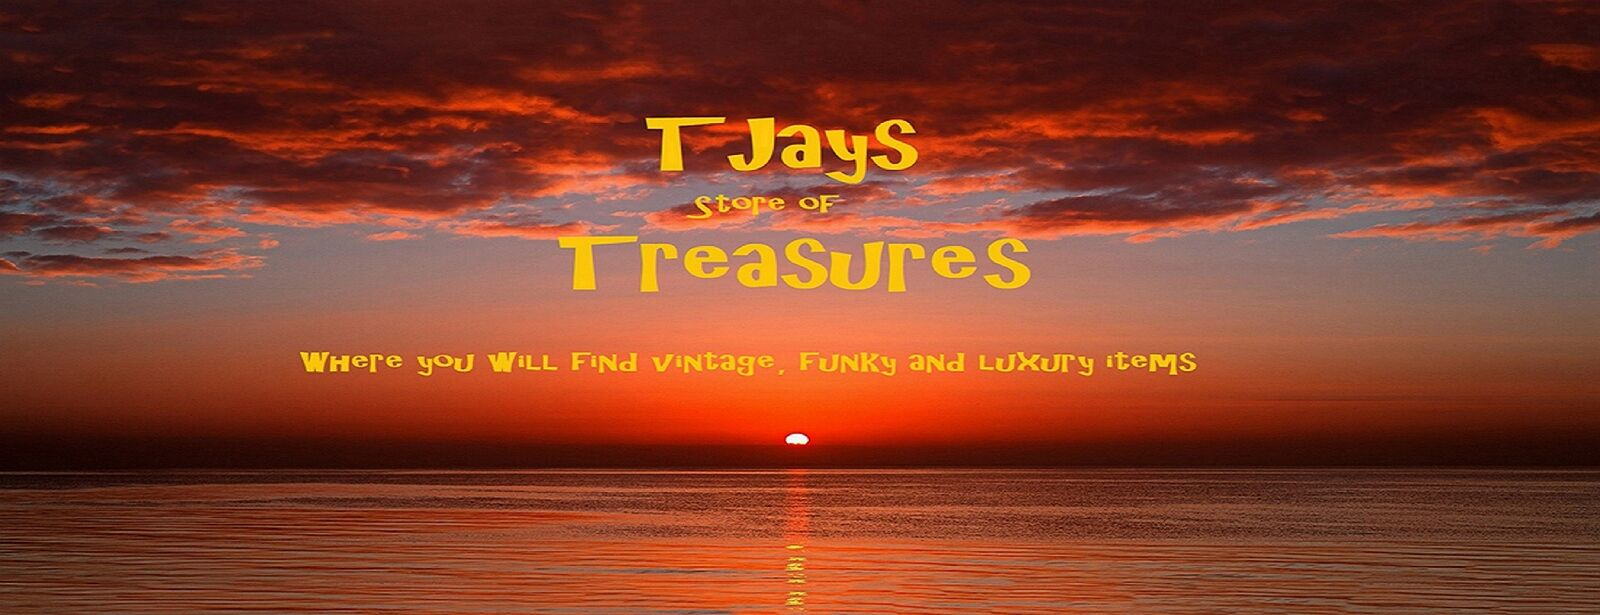 TjaysTreasures